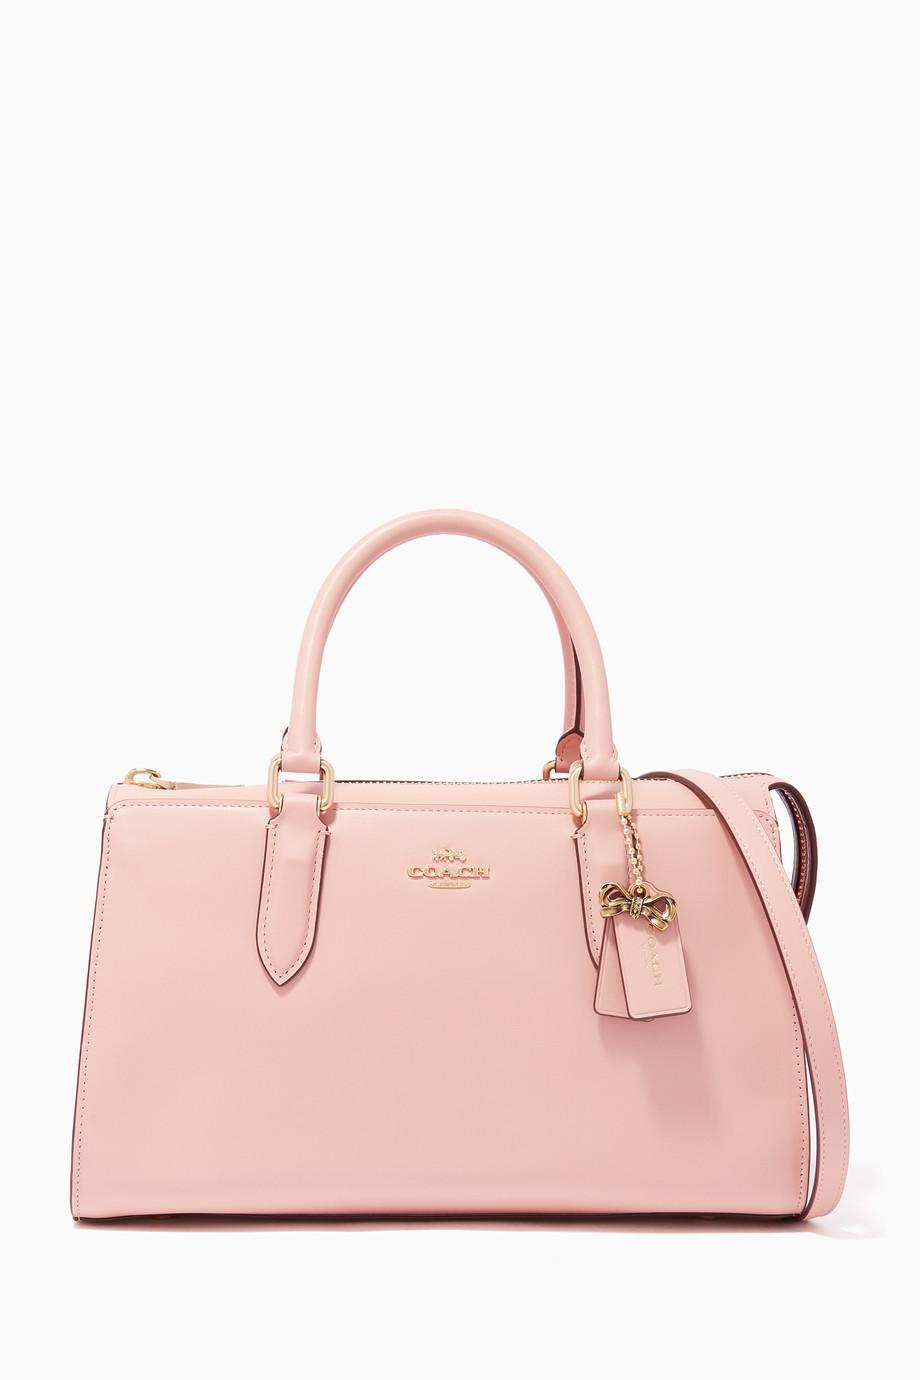 91f3f32d54 Shop Coach Pink Coach X Selena Gomez Selena Bond Bag for Women ...